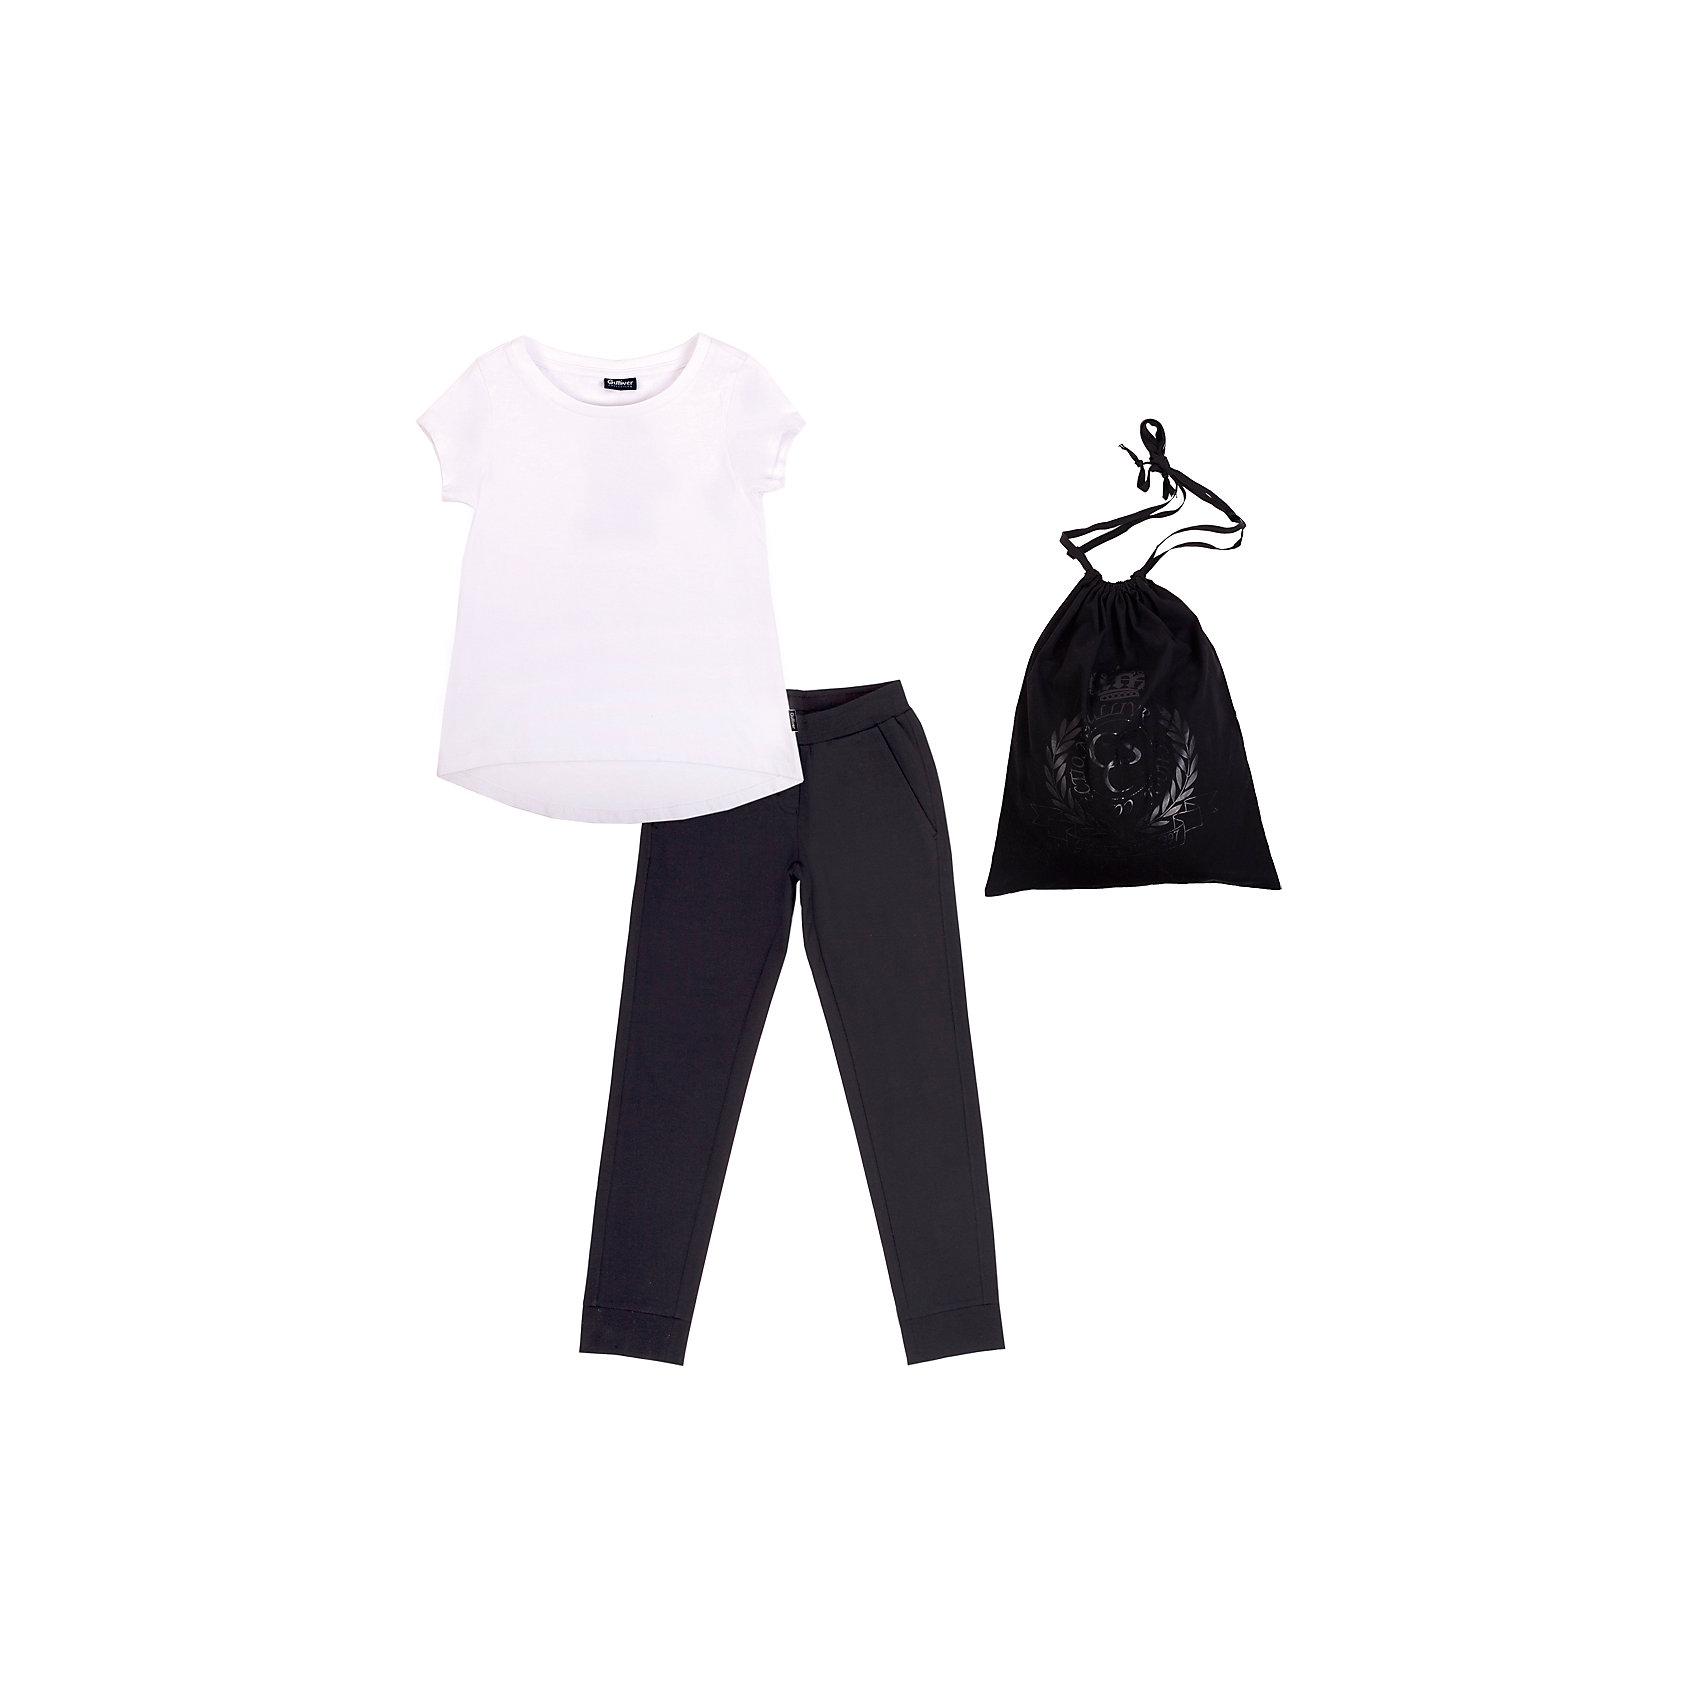 Gulliver Комплект: футболка и брюки для девочки Gulliver